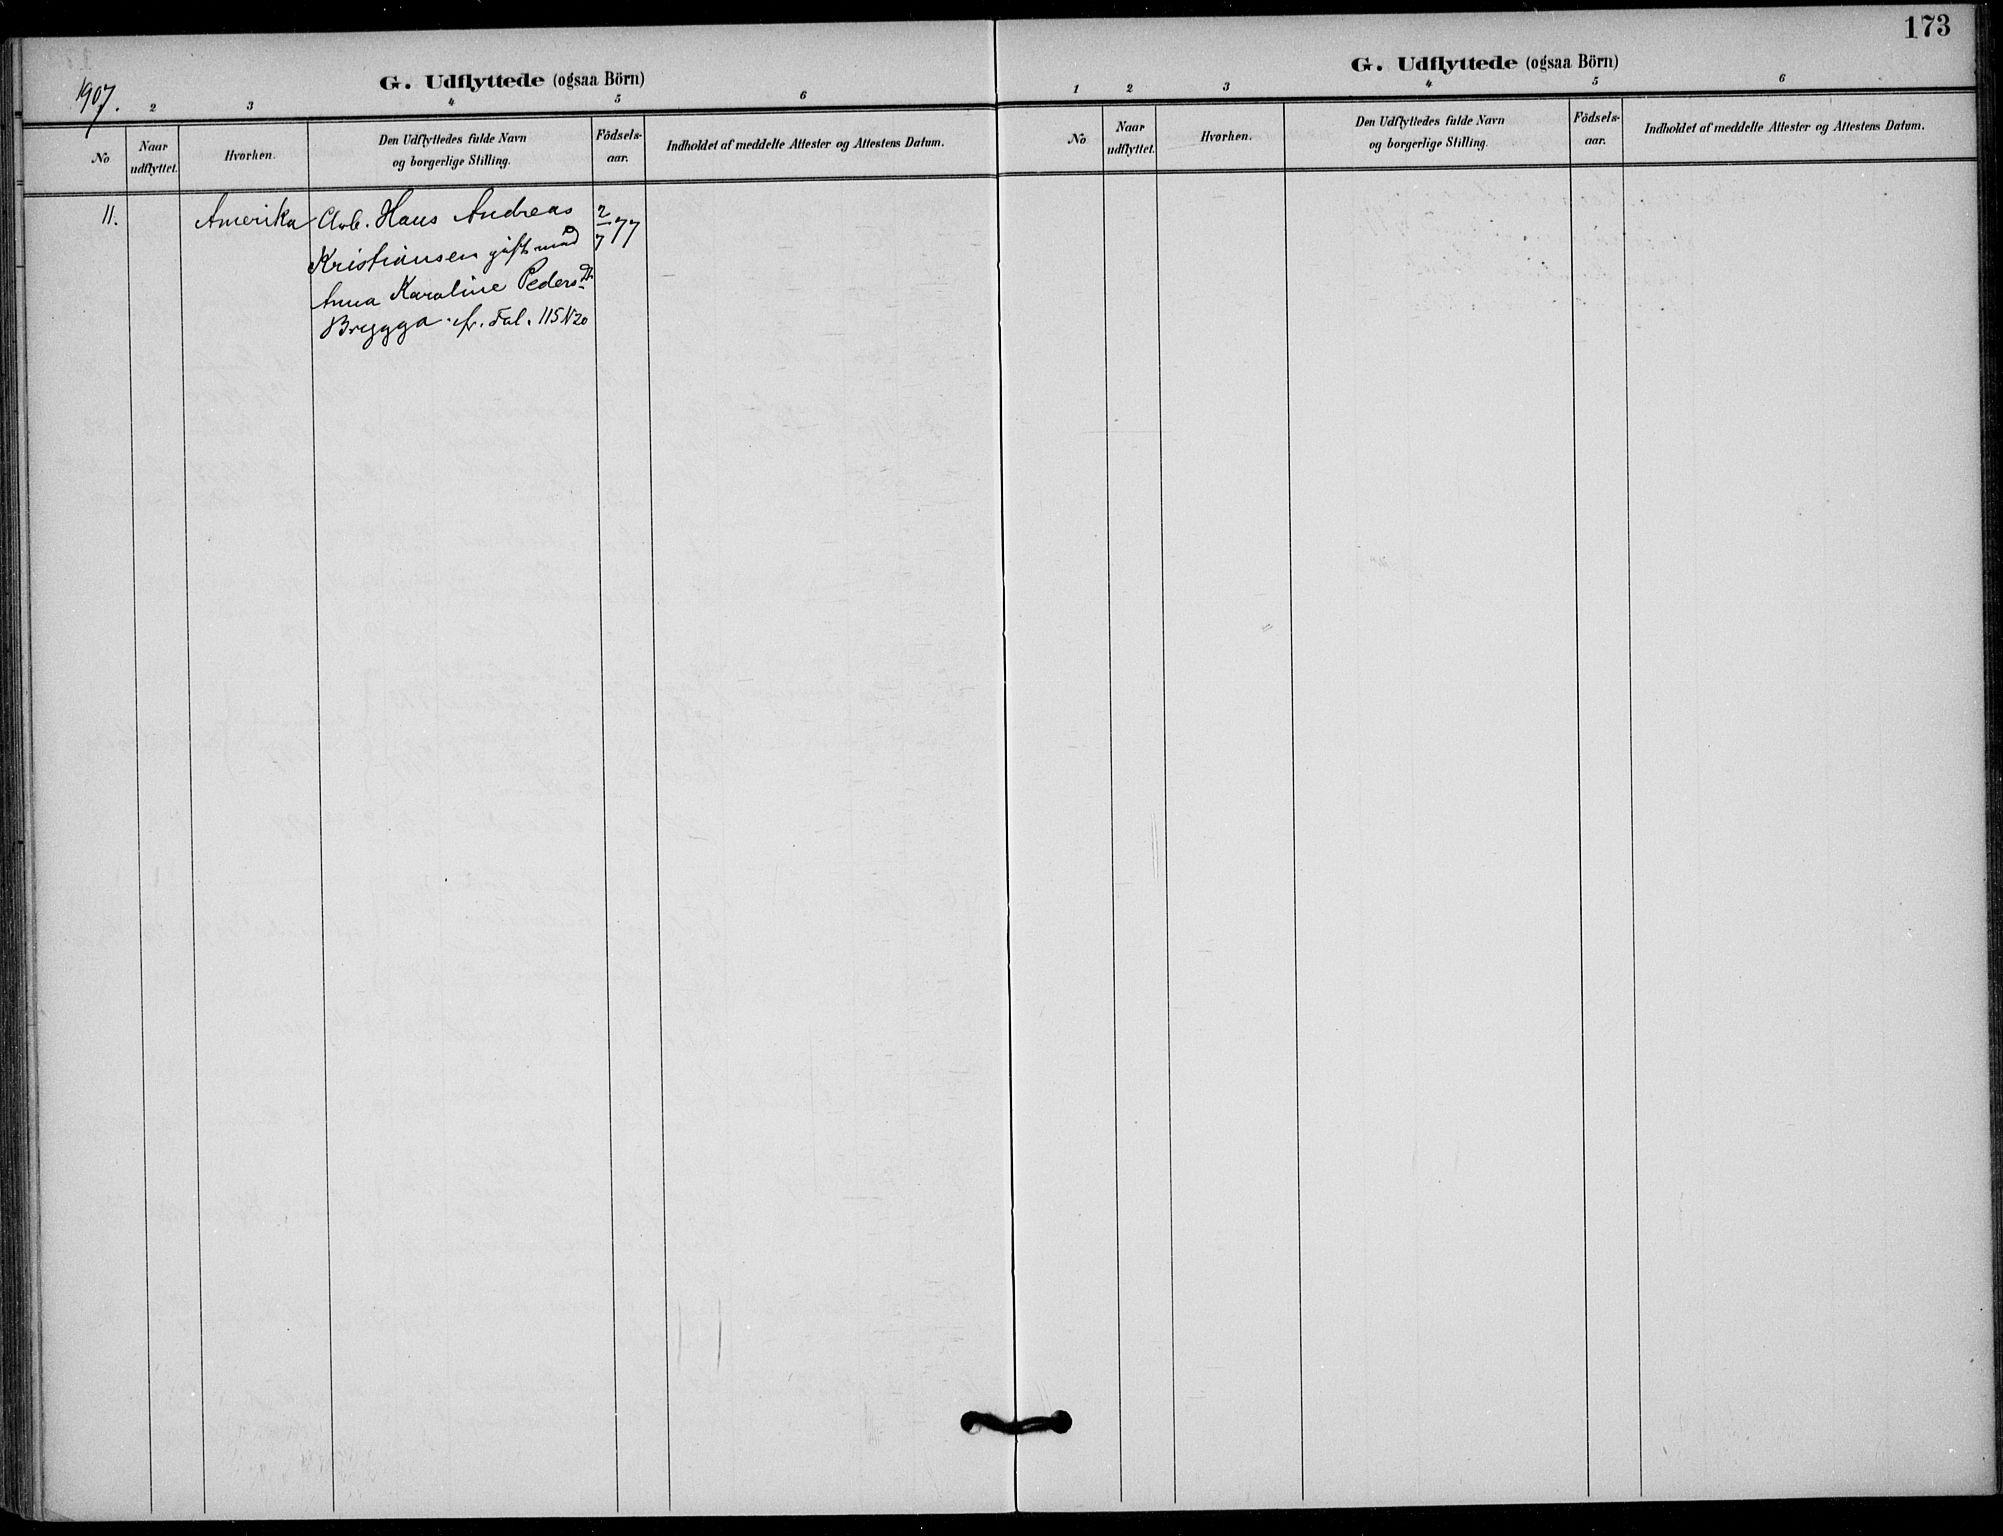 SAKO, Solum kirkebøker, F/Fb/L0002: Ministerialbok nr. II 2, 1893-1901, s. 173